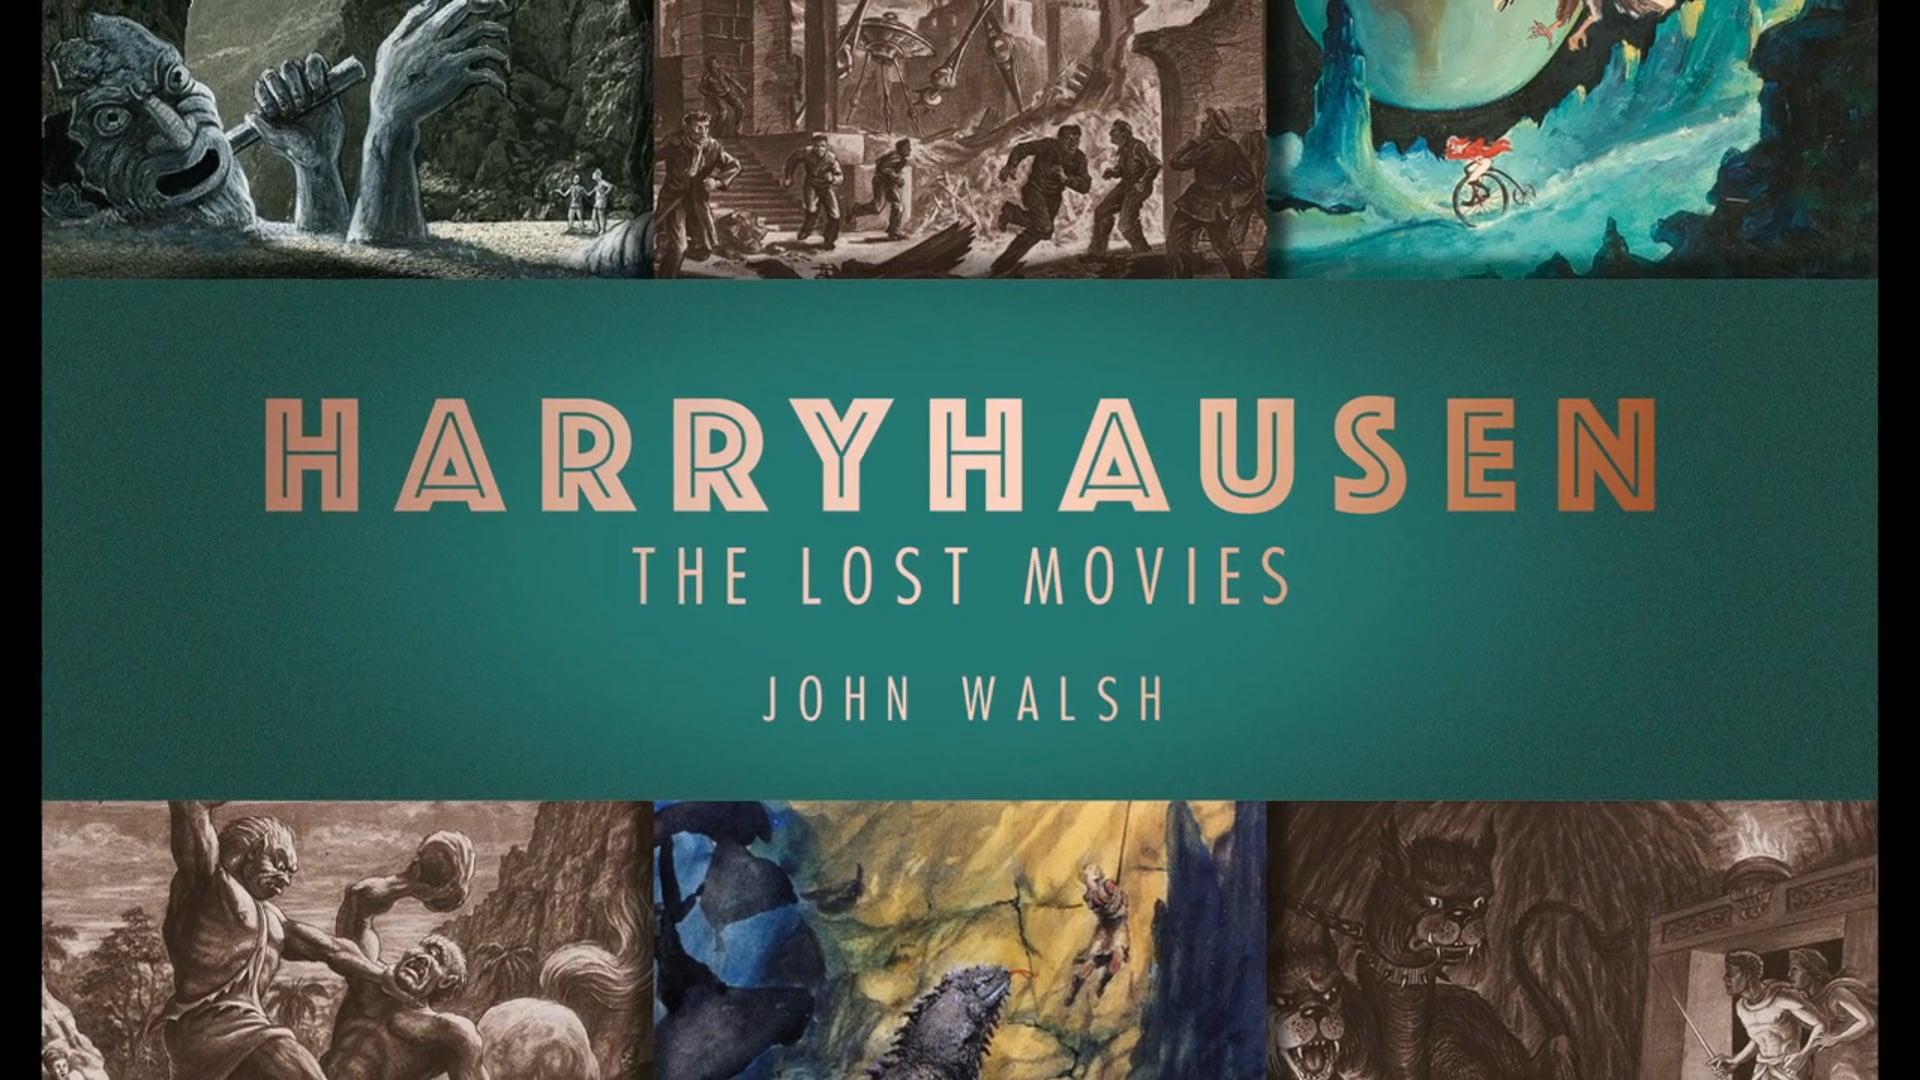 Harryhausen The Lost Movies official trailer